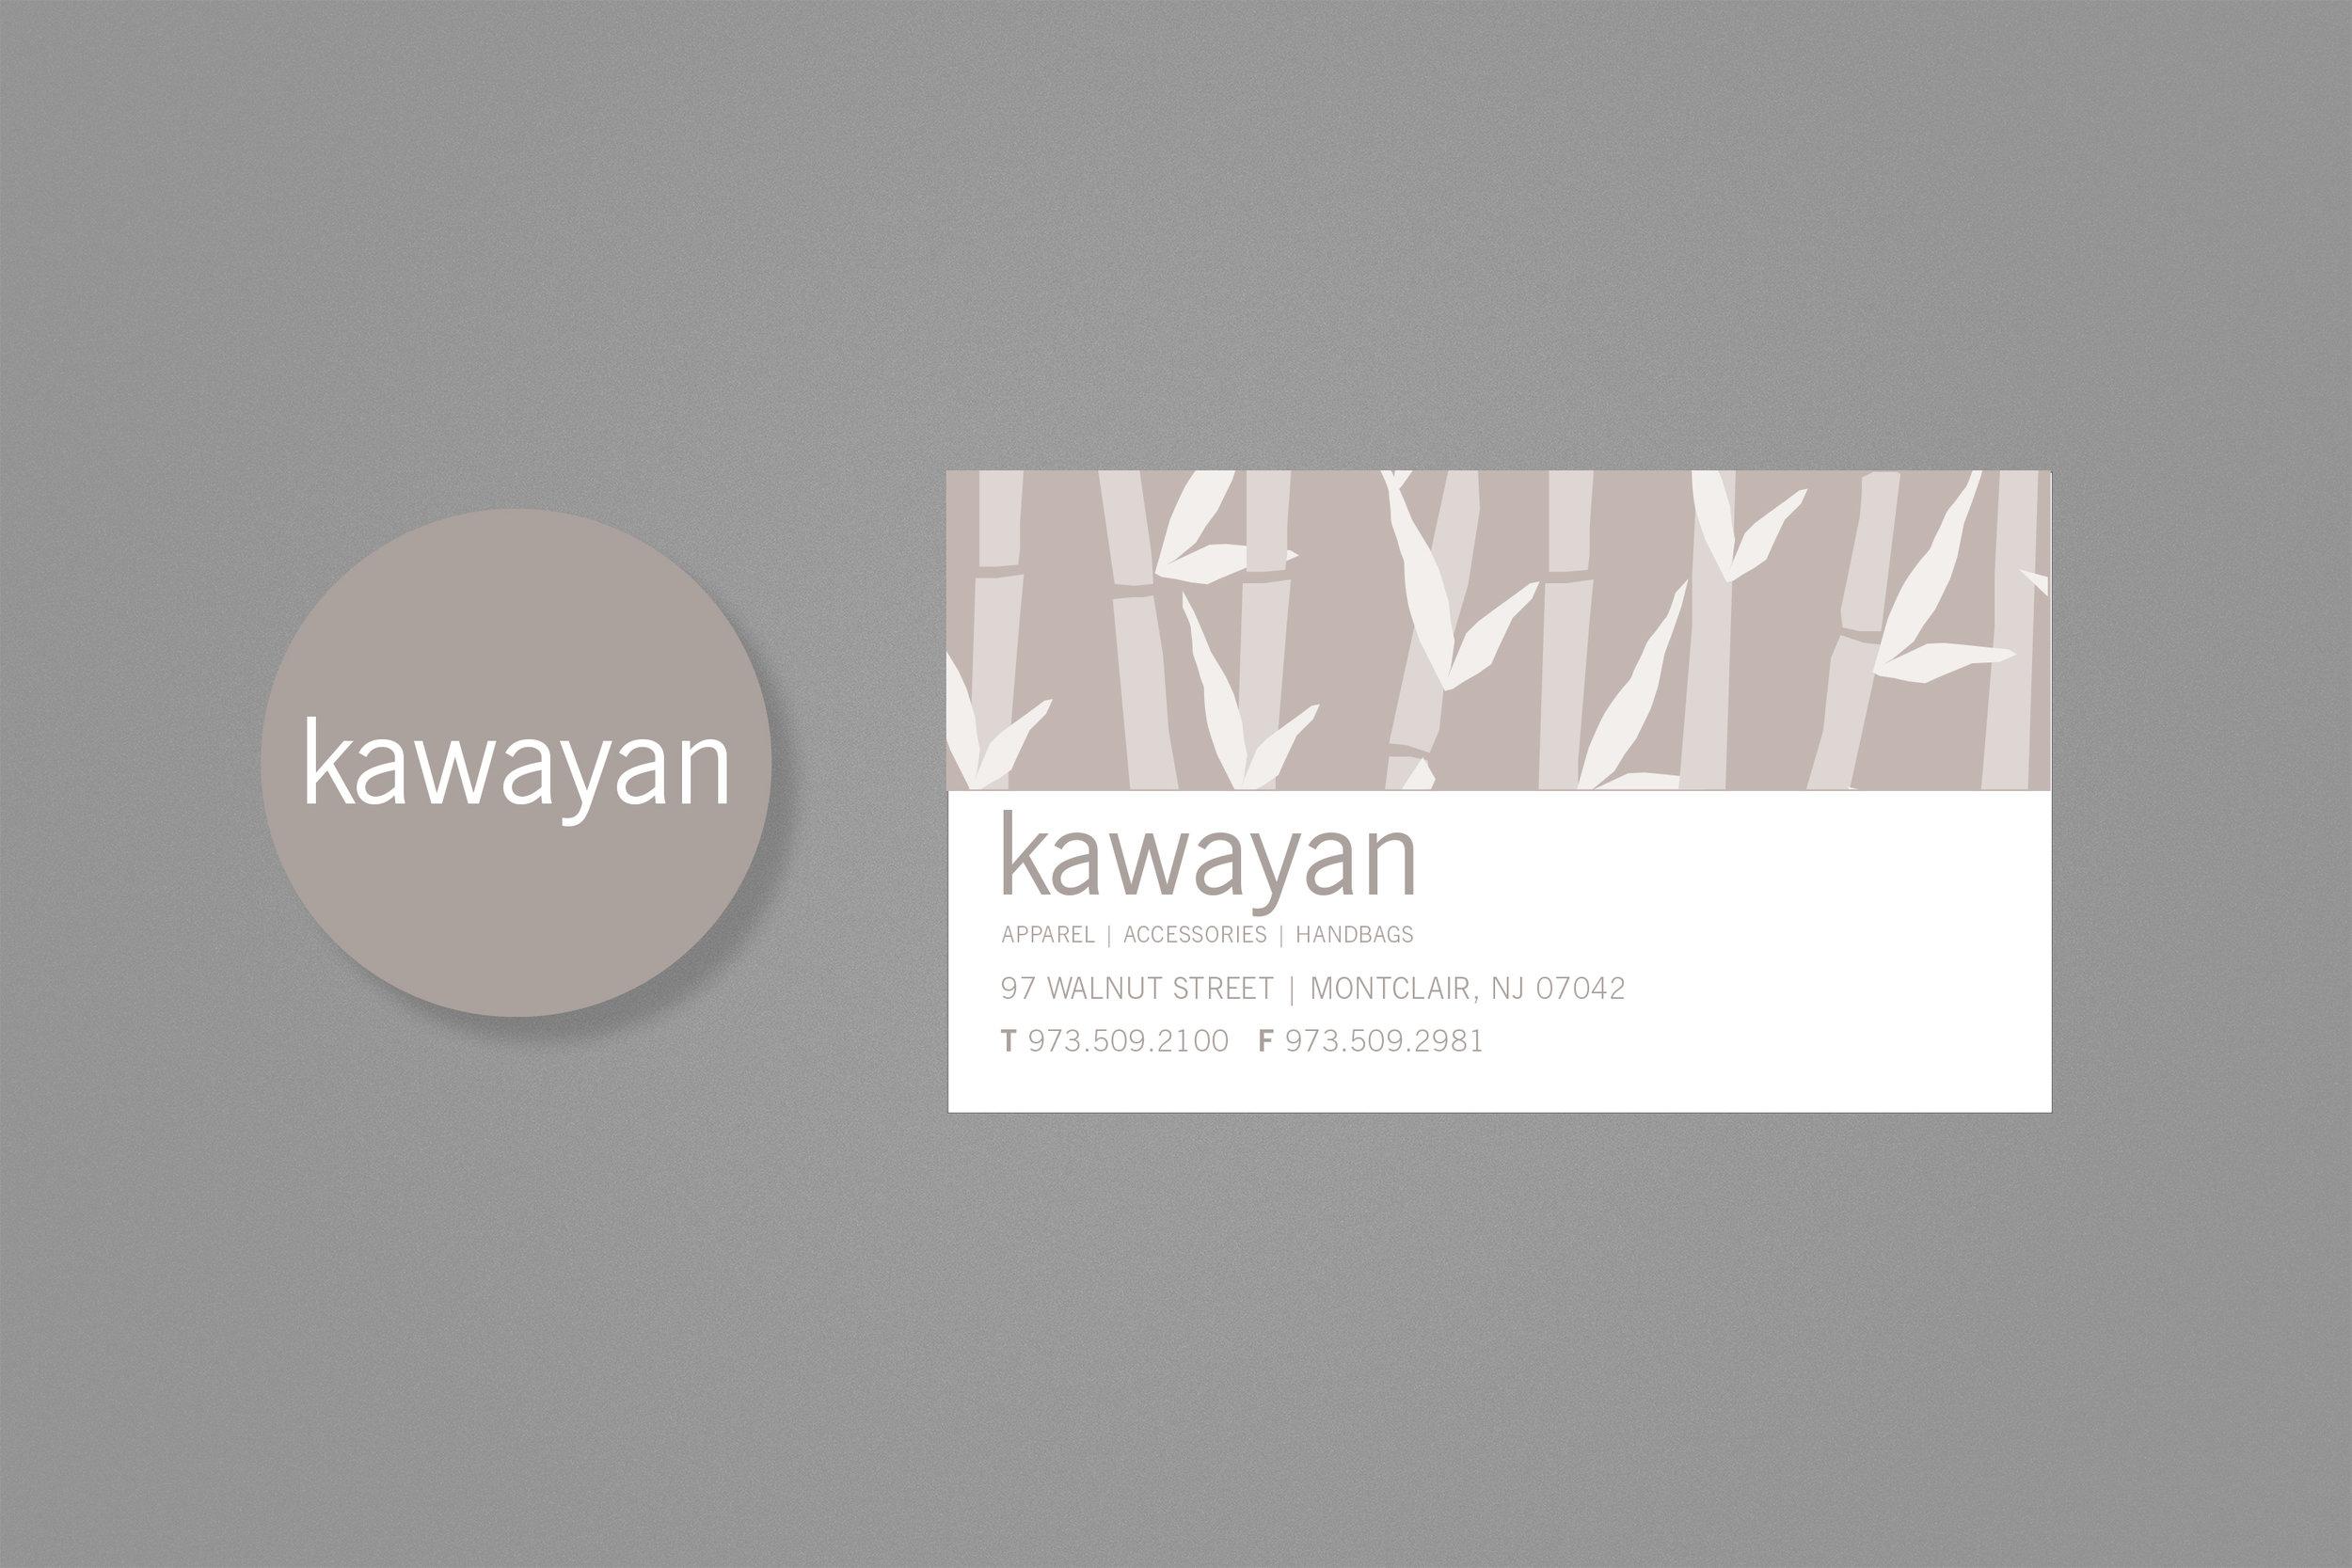 Kawayan Business Card